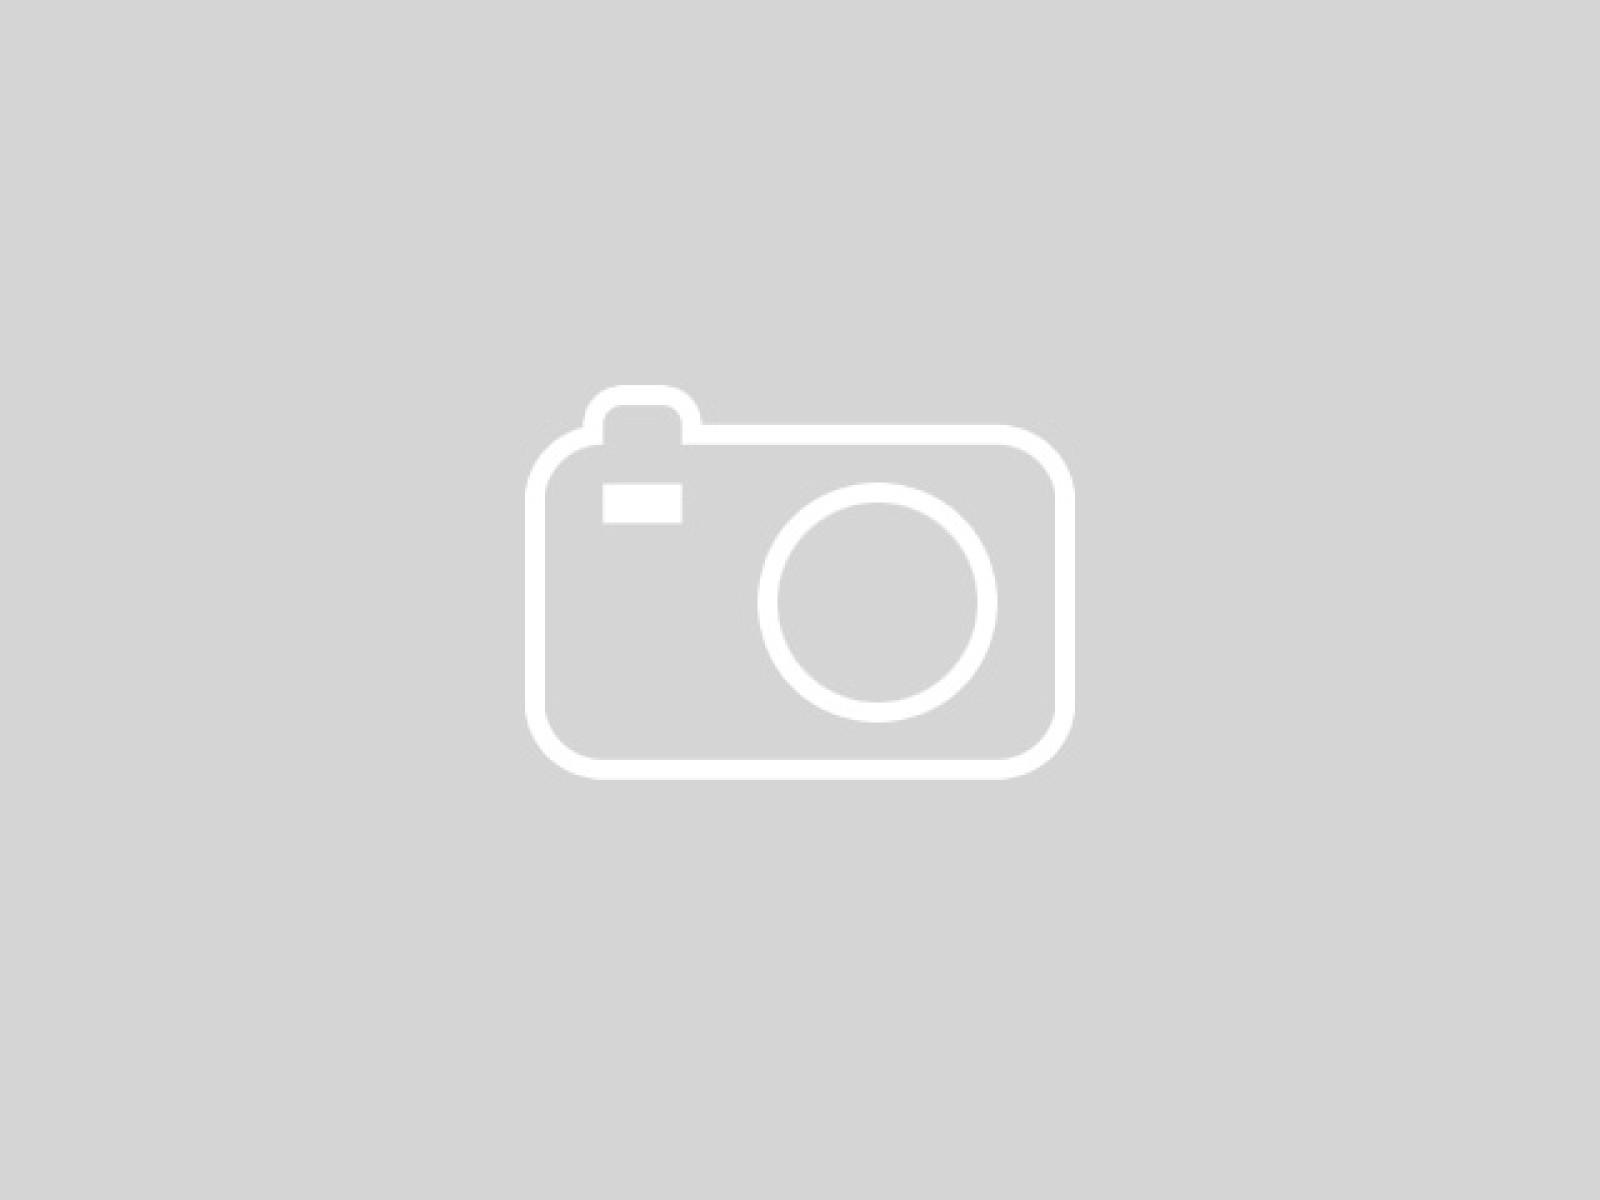 New 2021 Hyundai Elantra N Line DCT